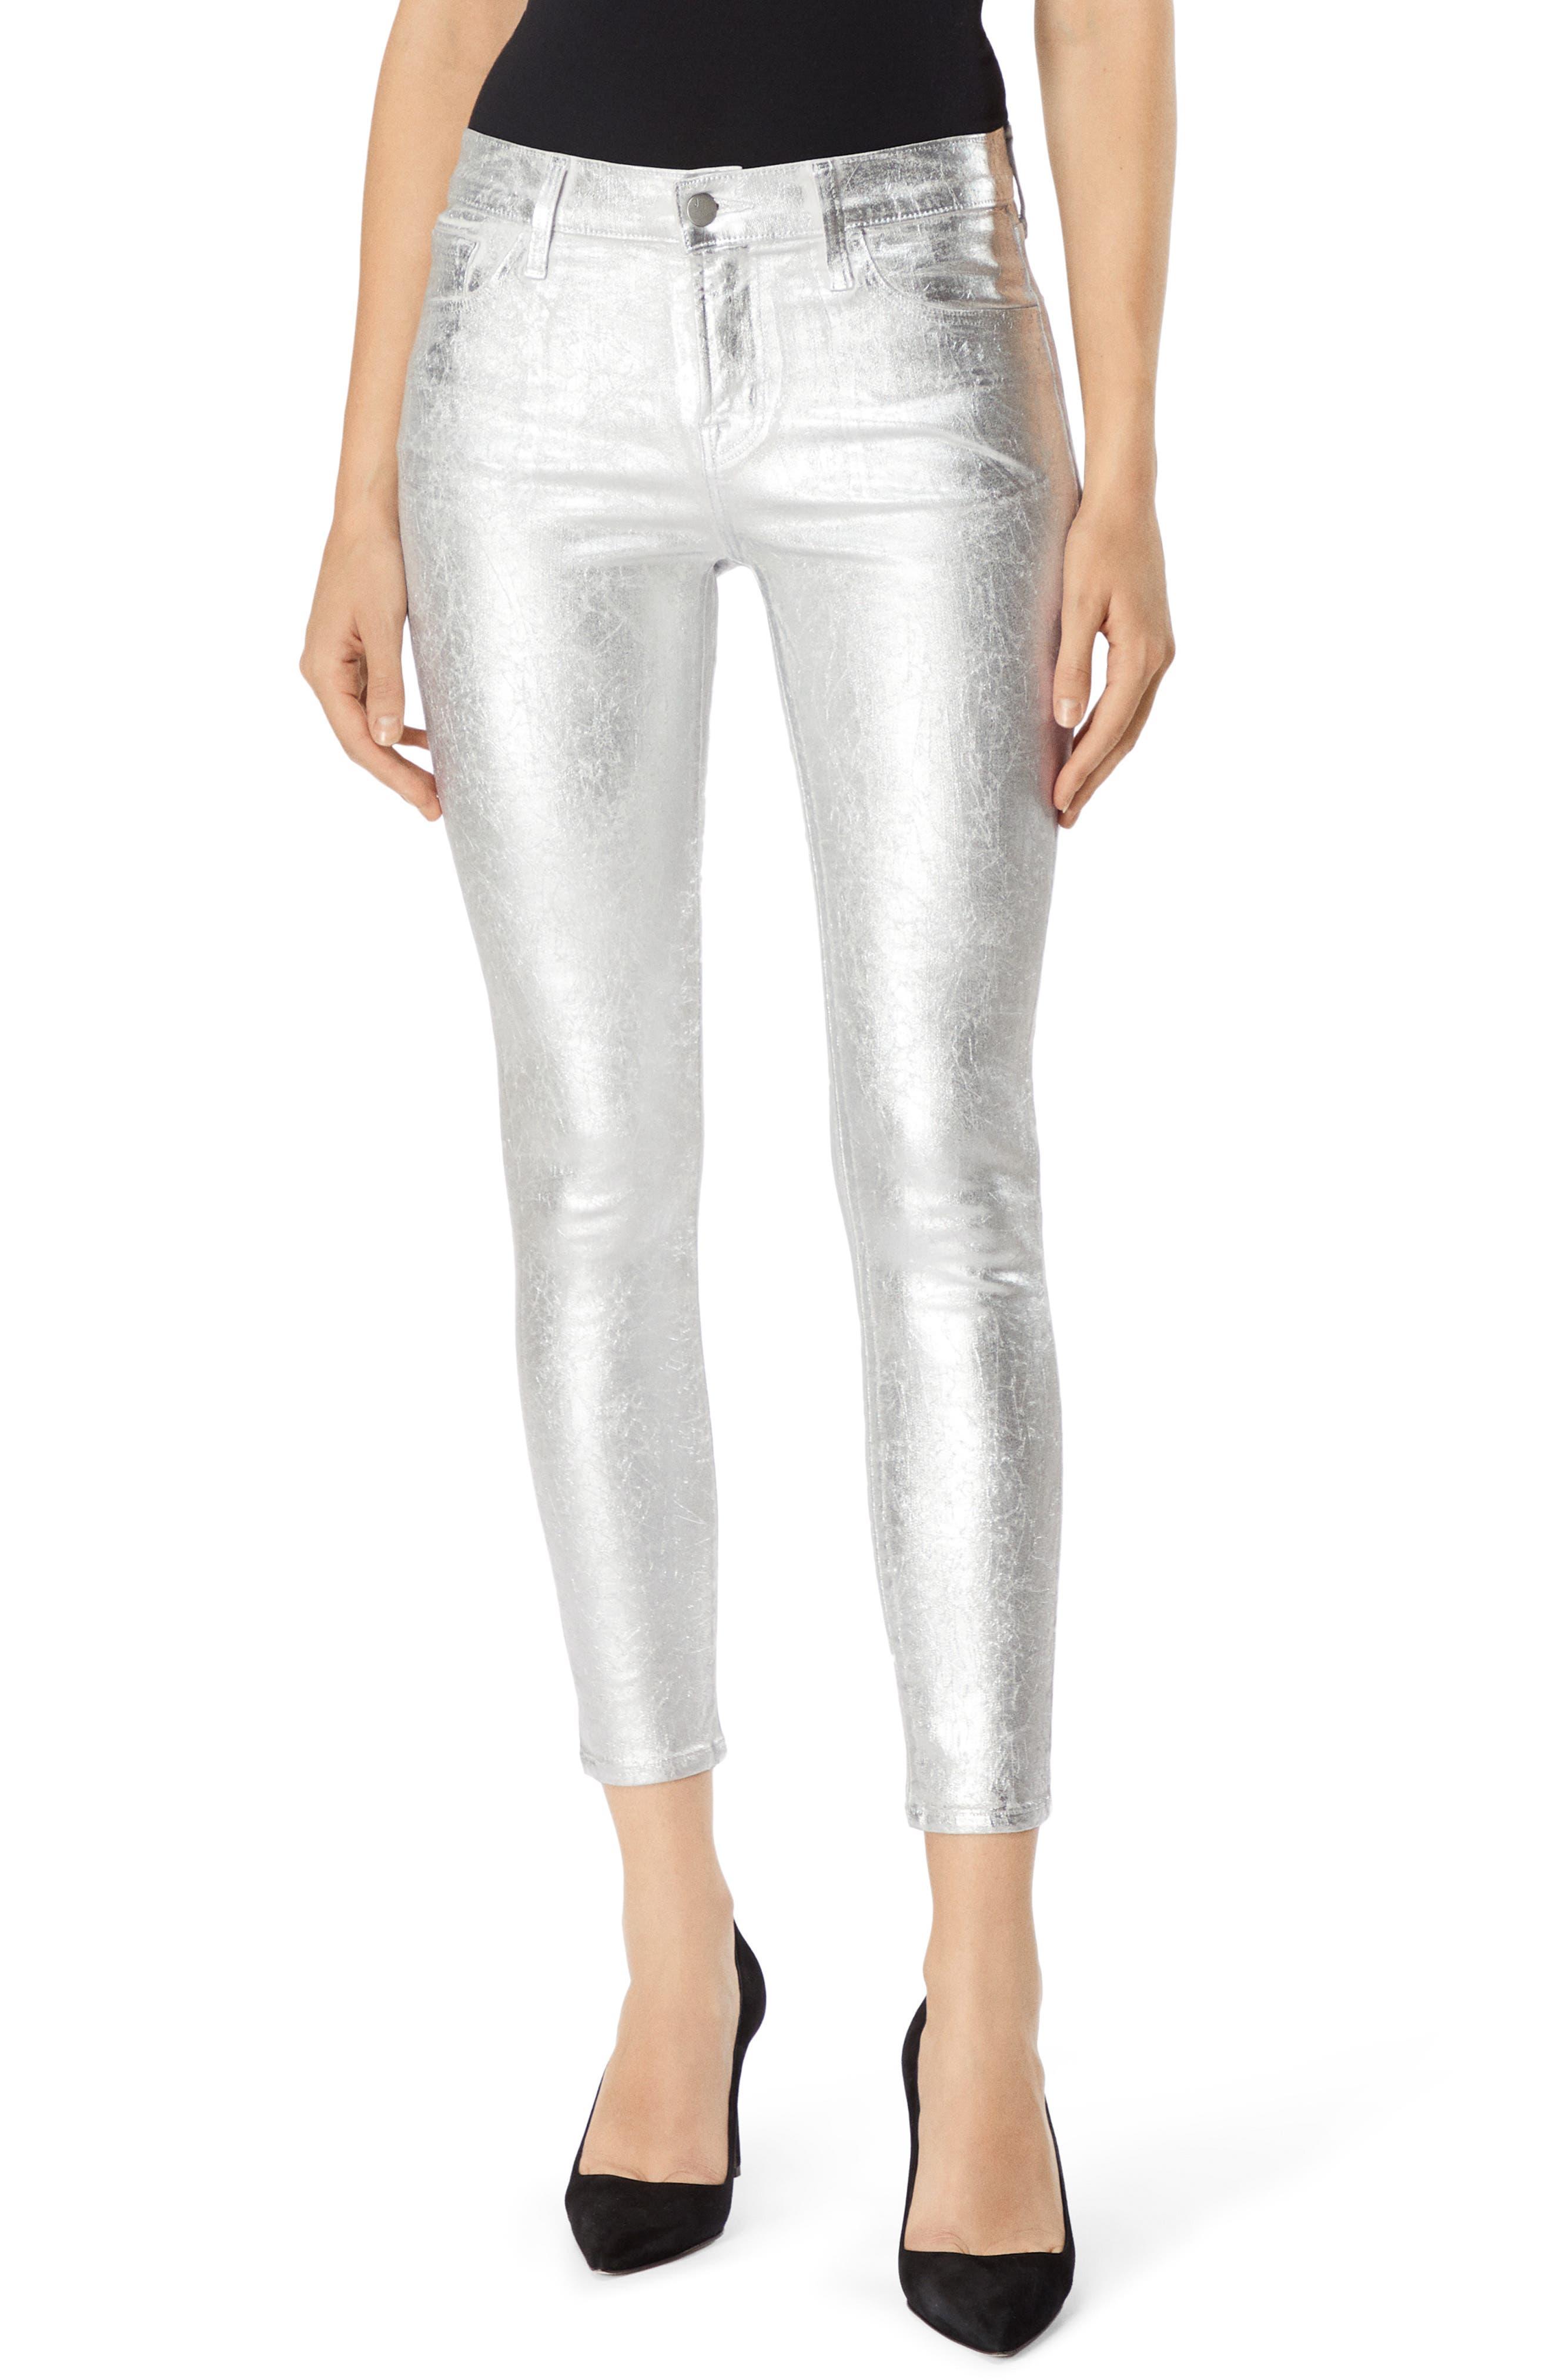 835 Capri Skinny Jeans,                         Main,                         color, SUPERMOON CRISTALLINE